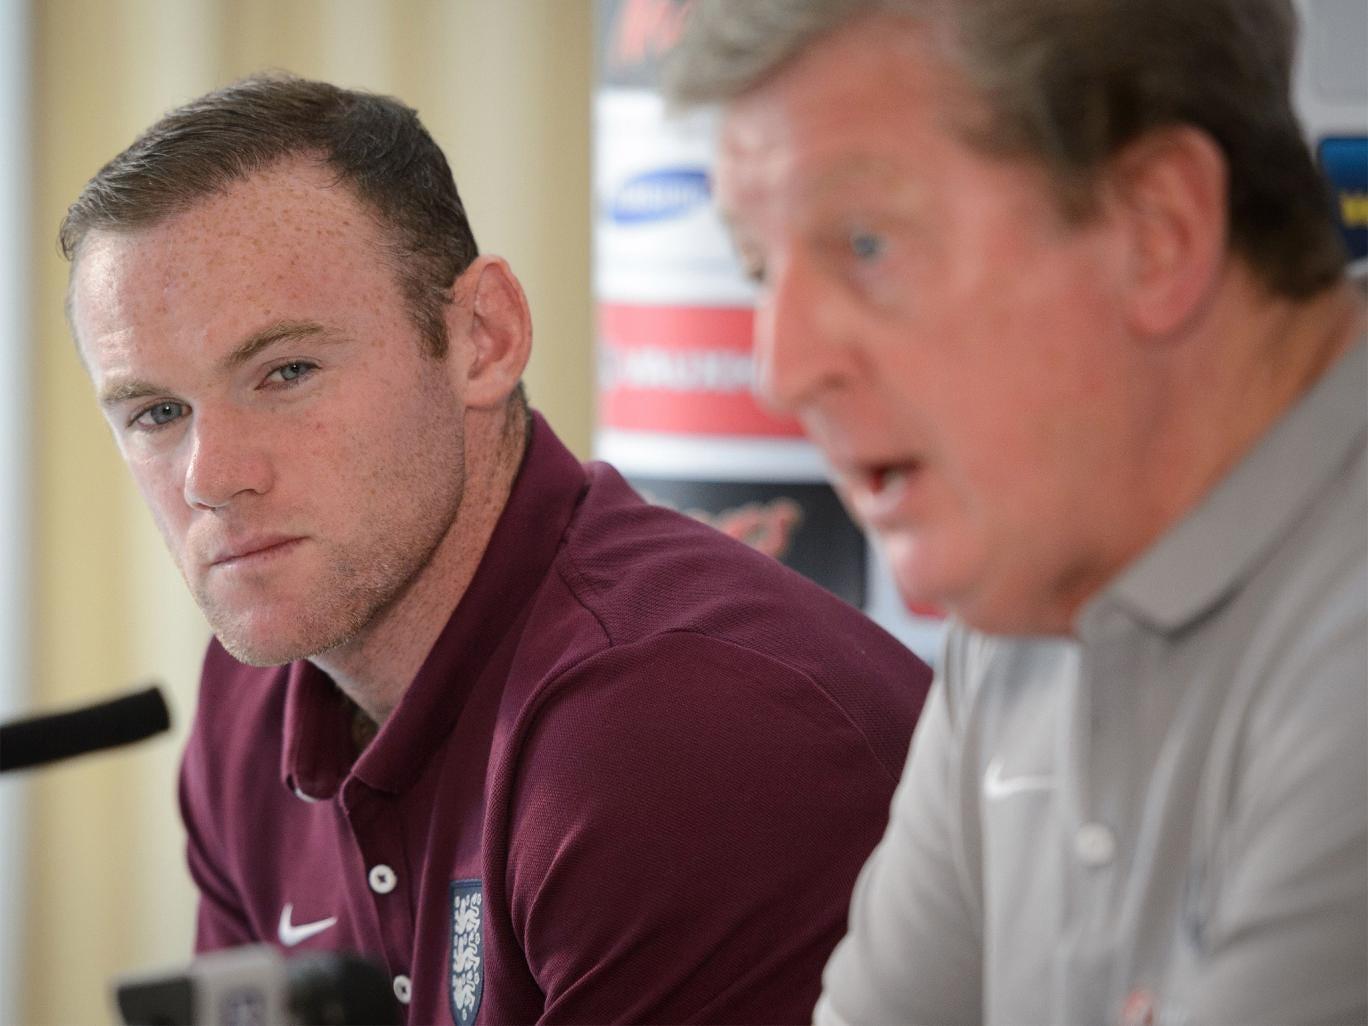 Wayne Rooney watches as England manager Roy Hodgson addresses the media